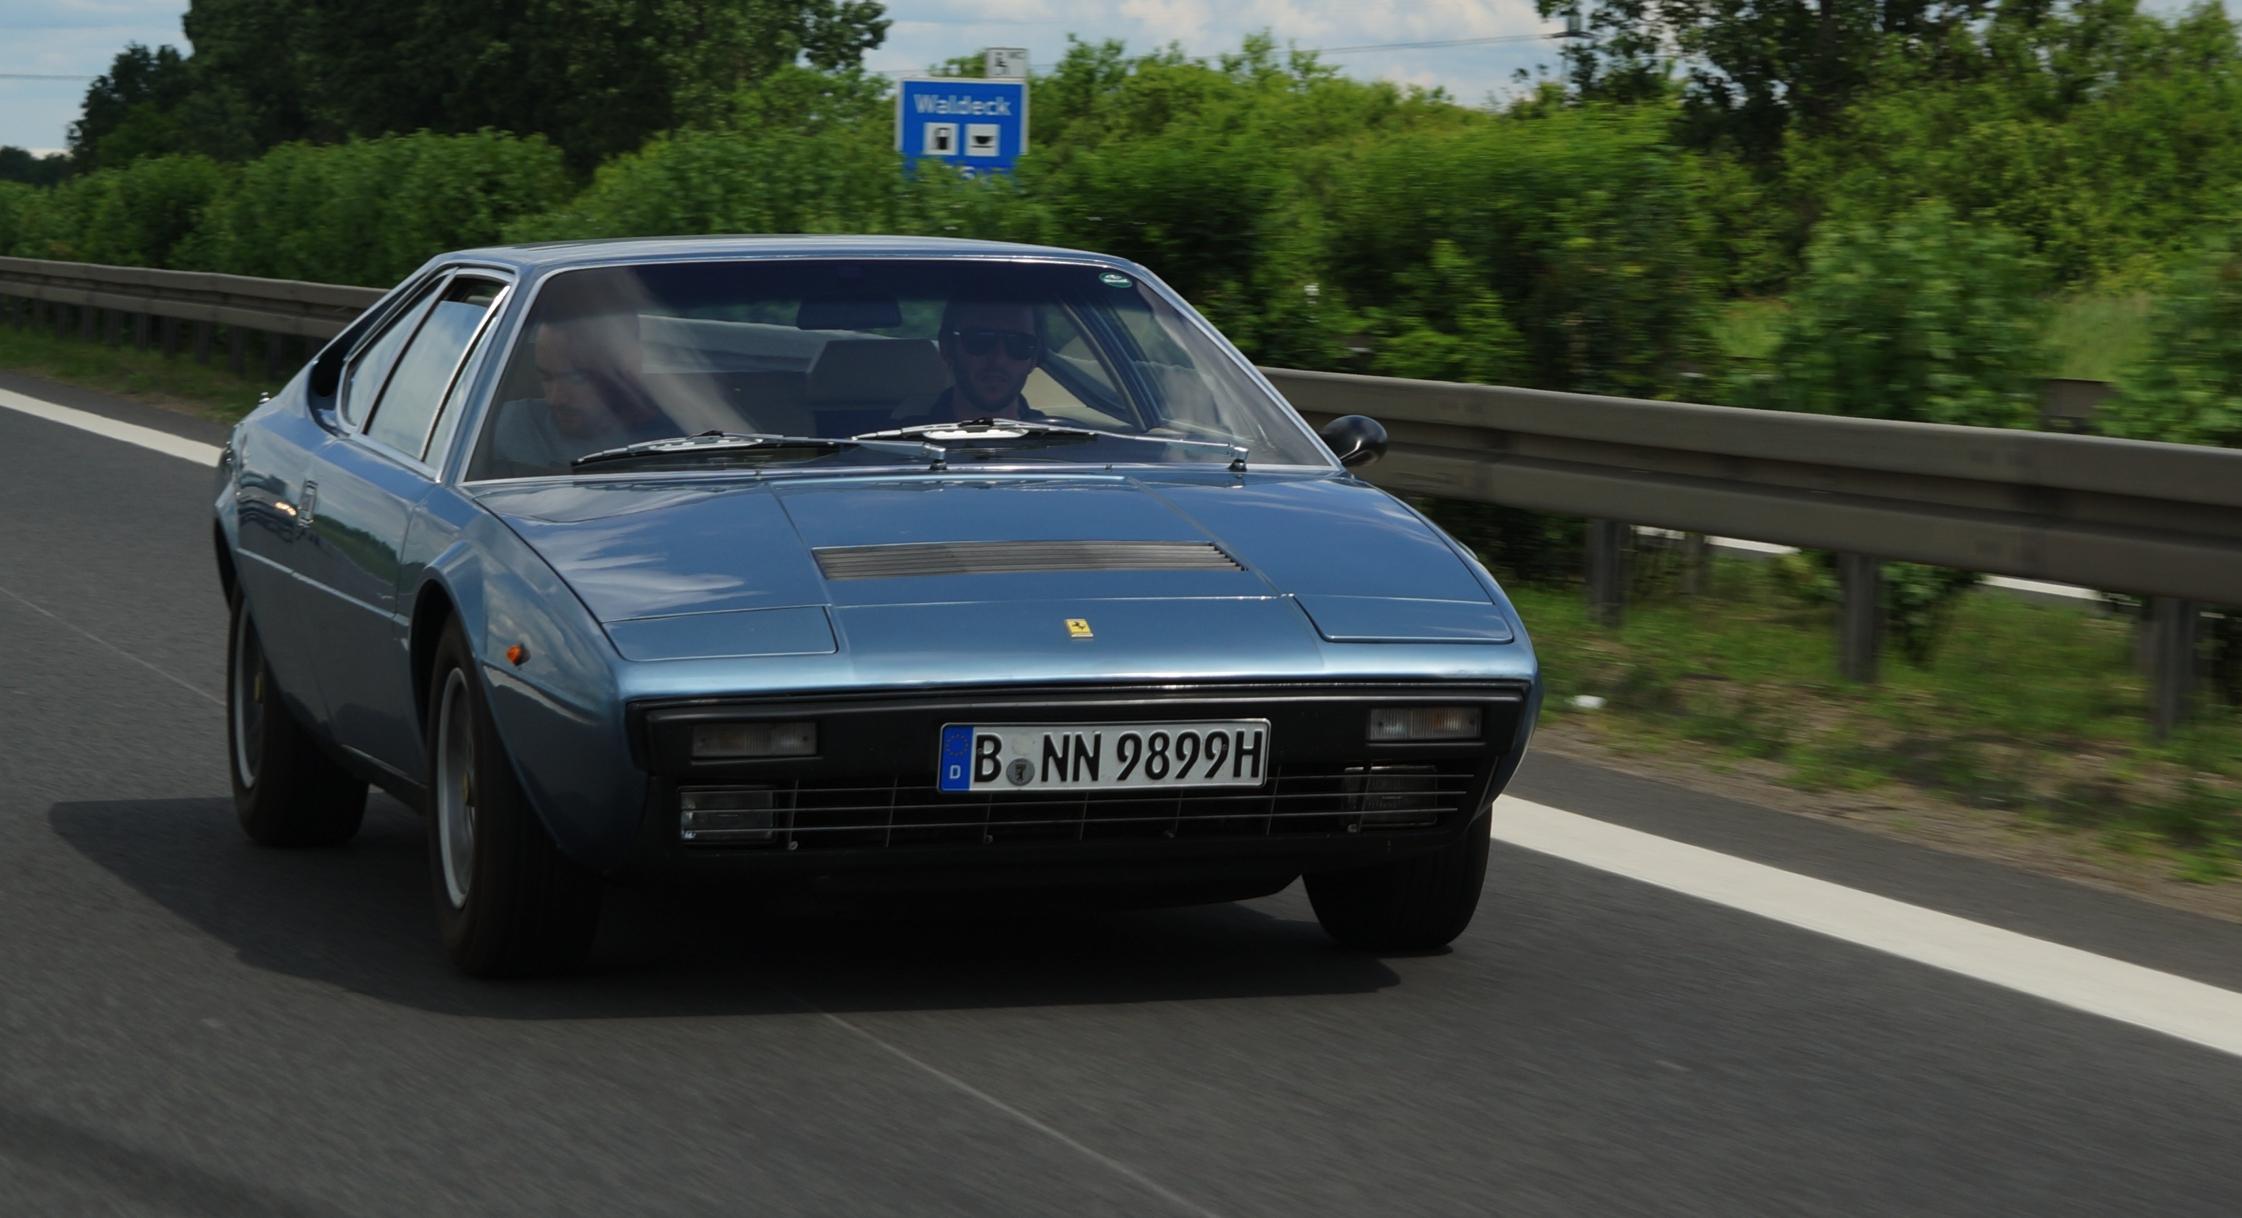 Freunde-von-Freunden-Thomas-Marecki-HT00079 Outstanding Ferrari Mondial 8 Sale south Africa Cars Trend